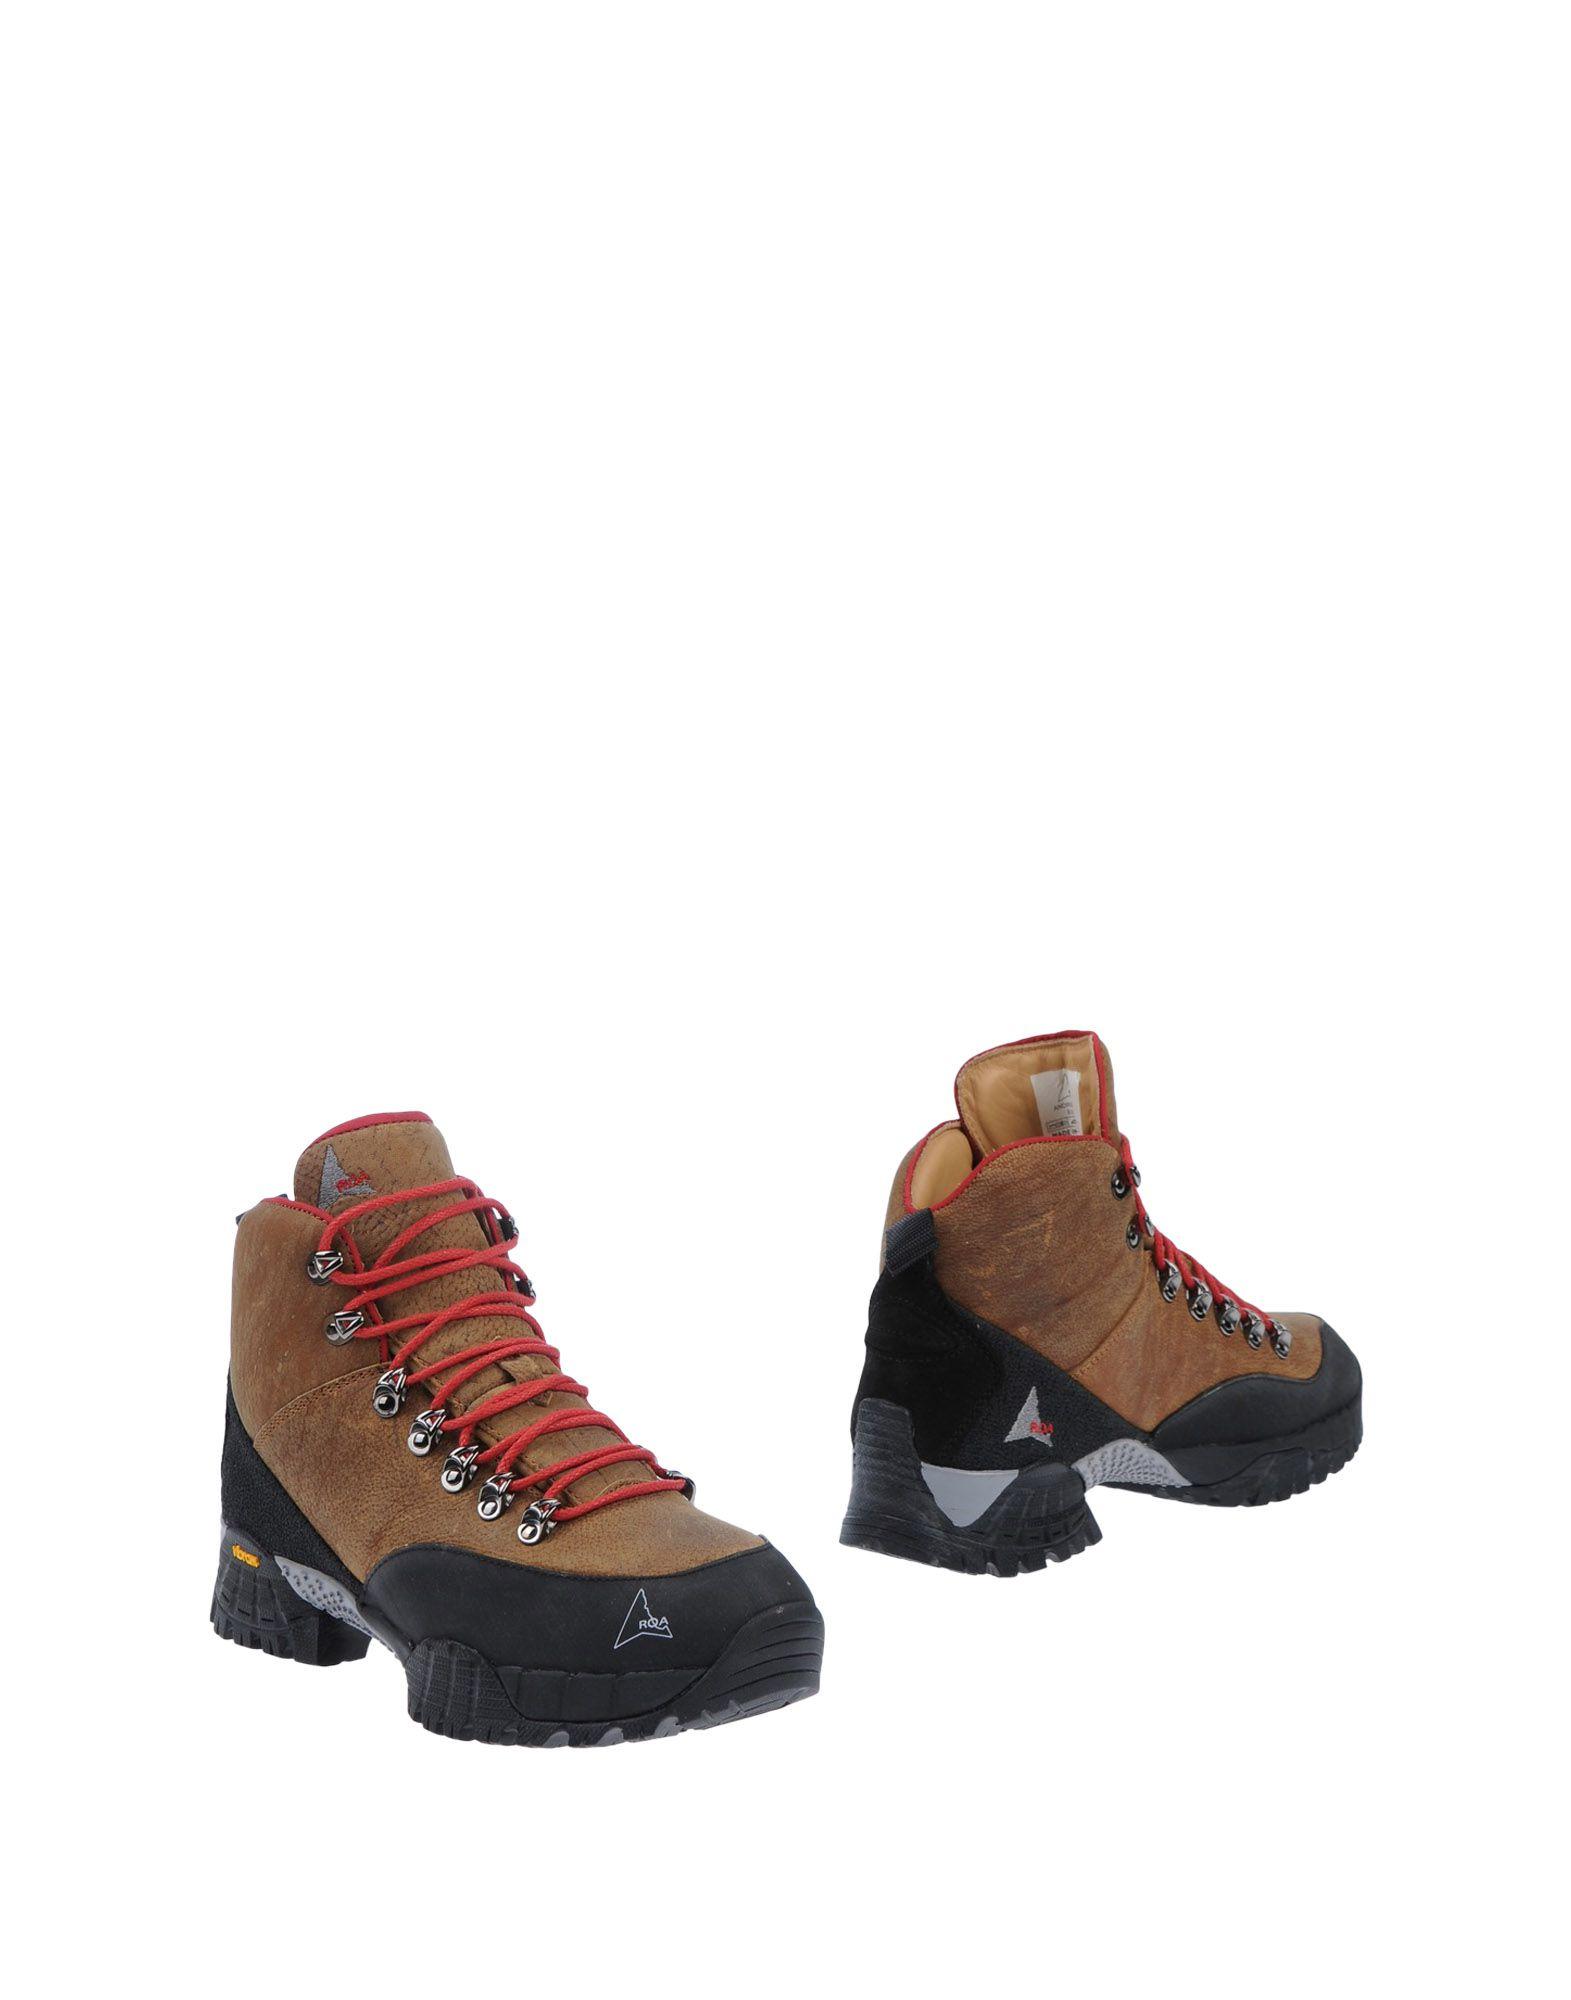 Roa Gute Stiefelette Herren  11506856GD Gute Roa Qualität beliebte Schuhe 44461f